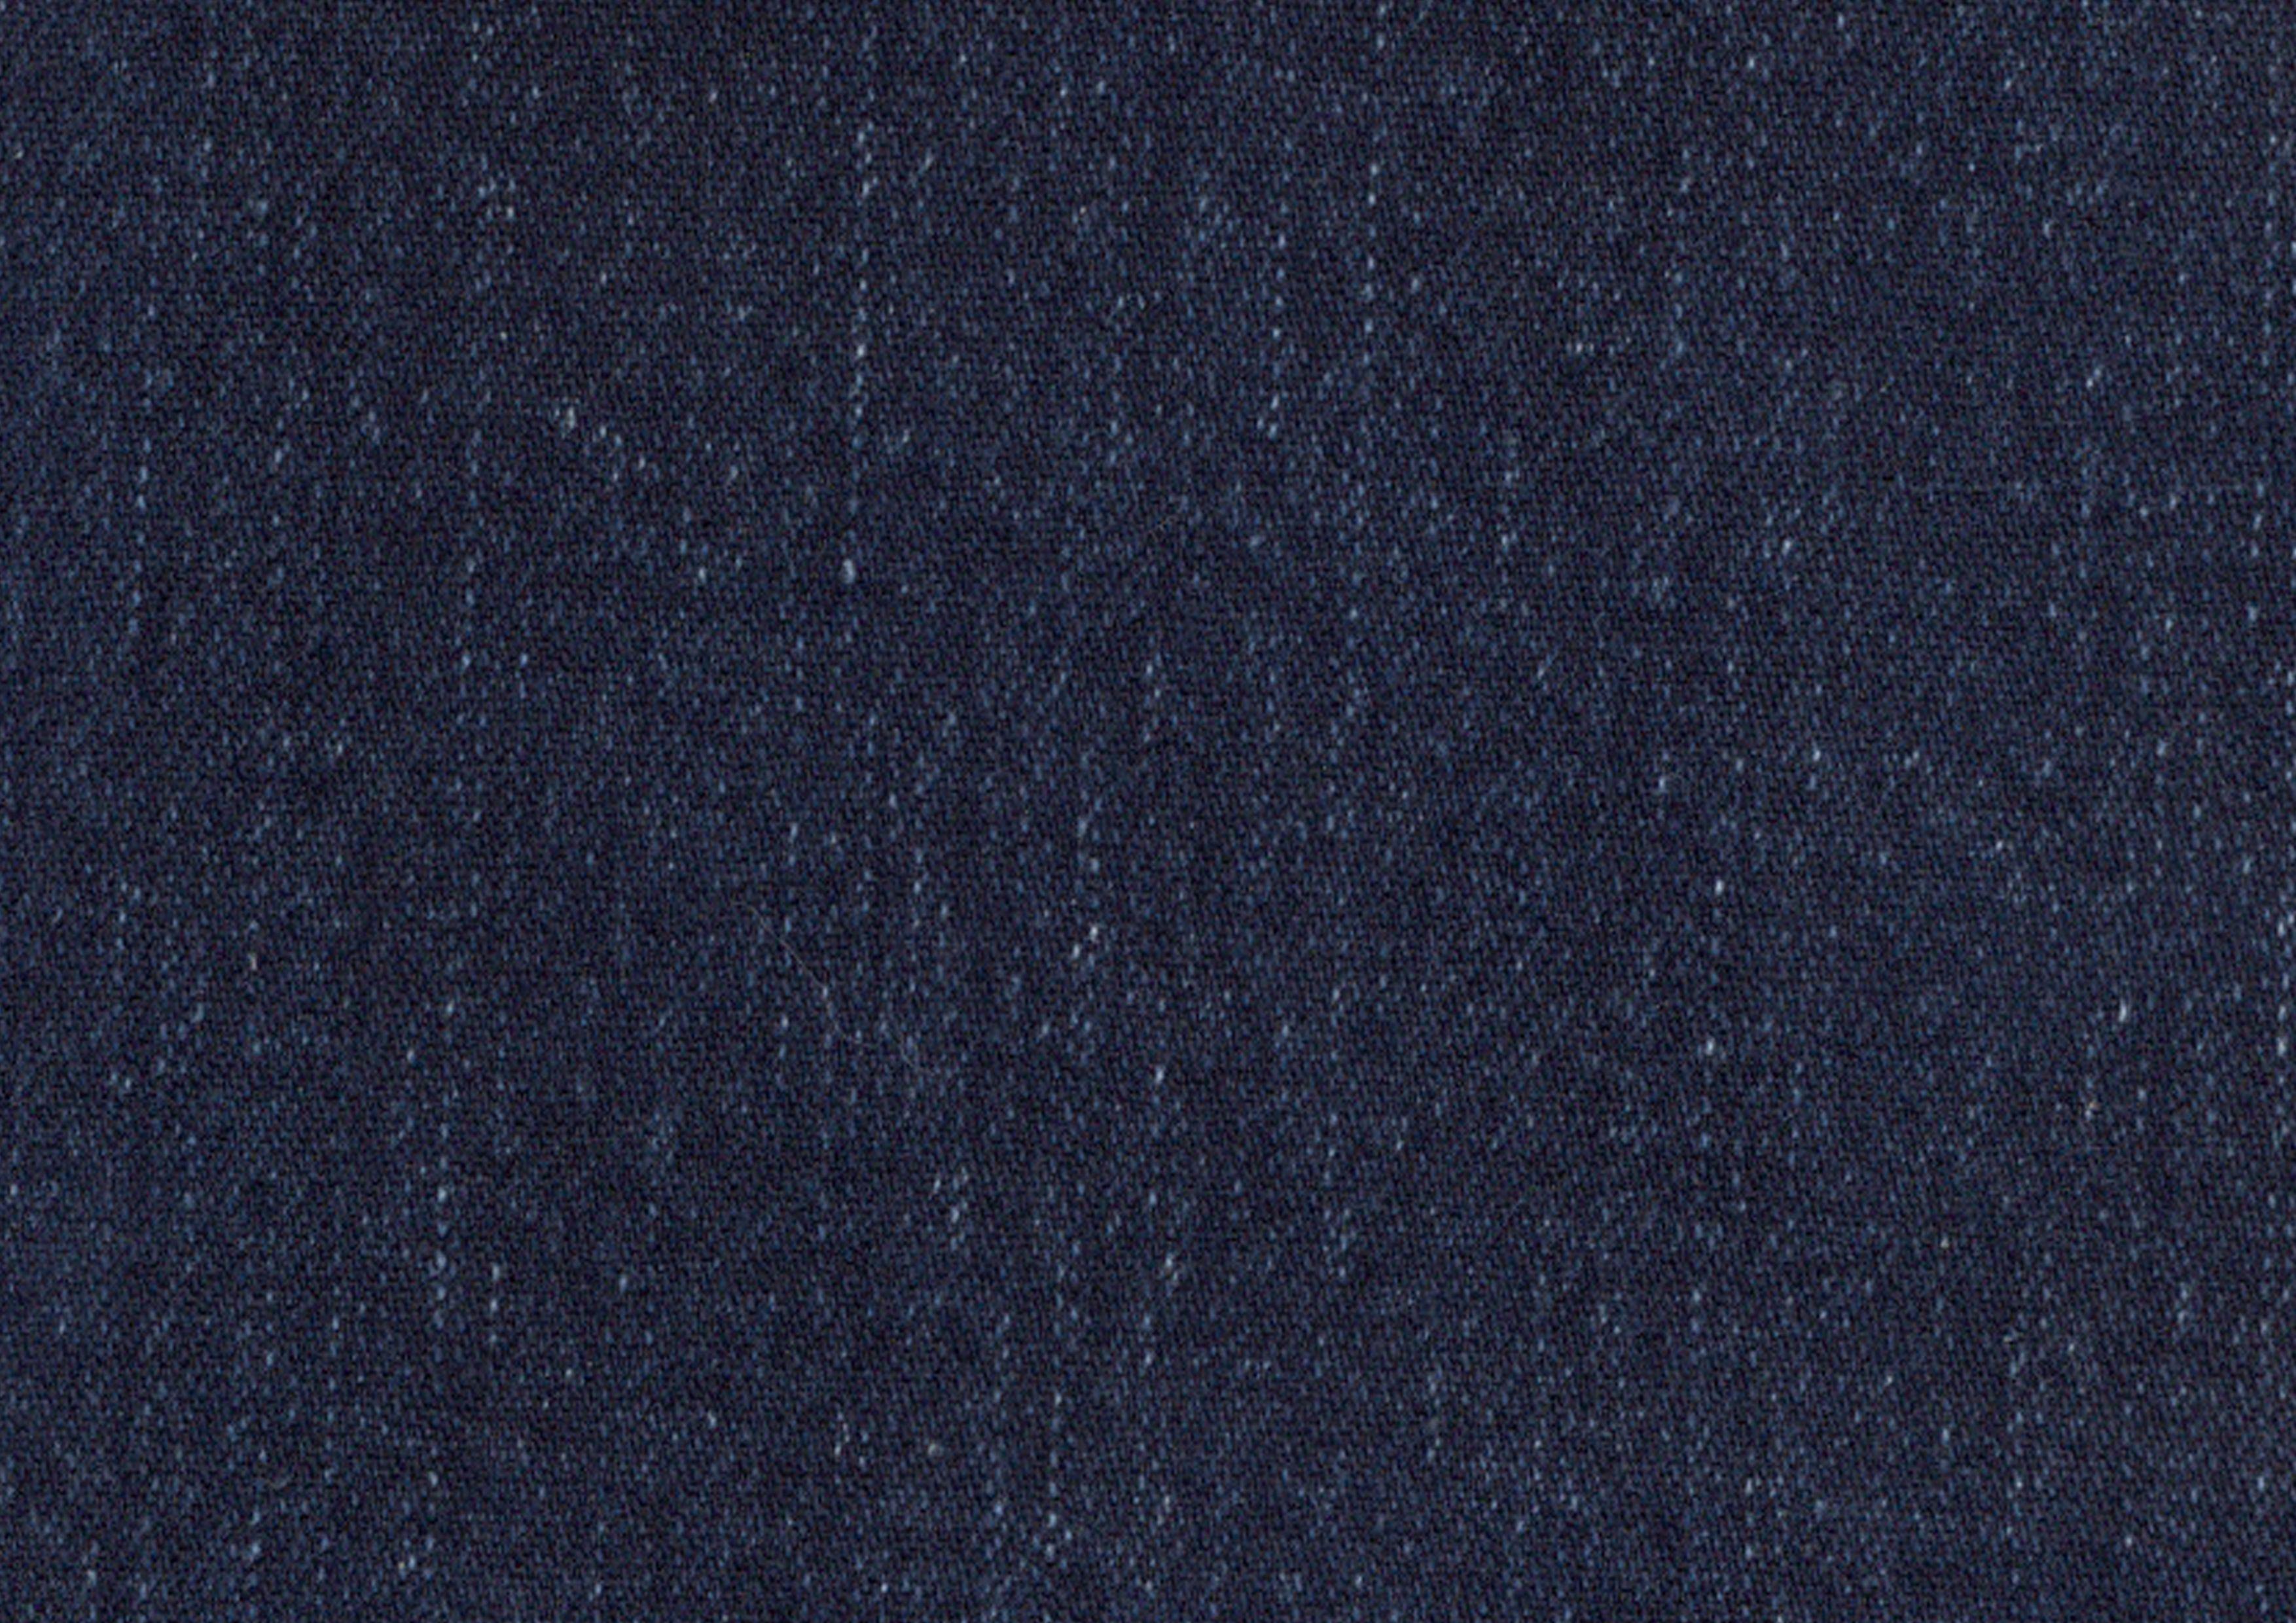 Dark Blue Pantone 533 C